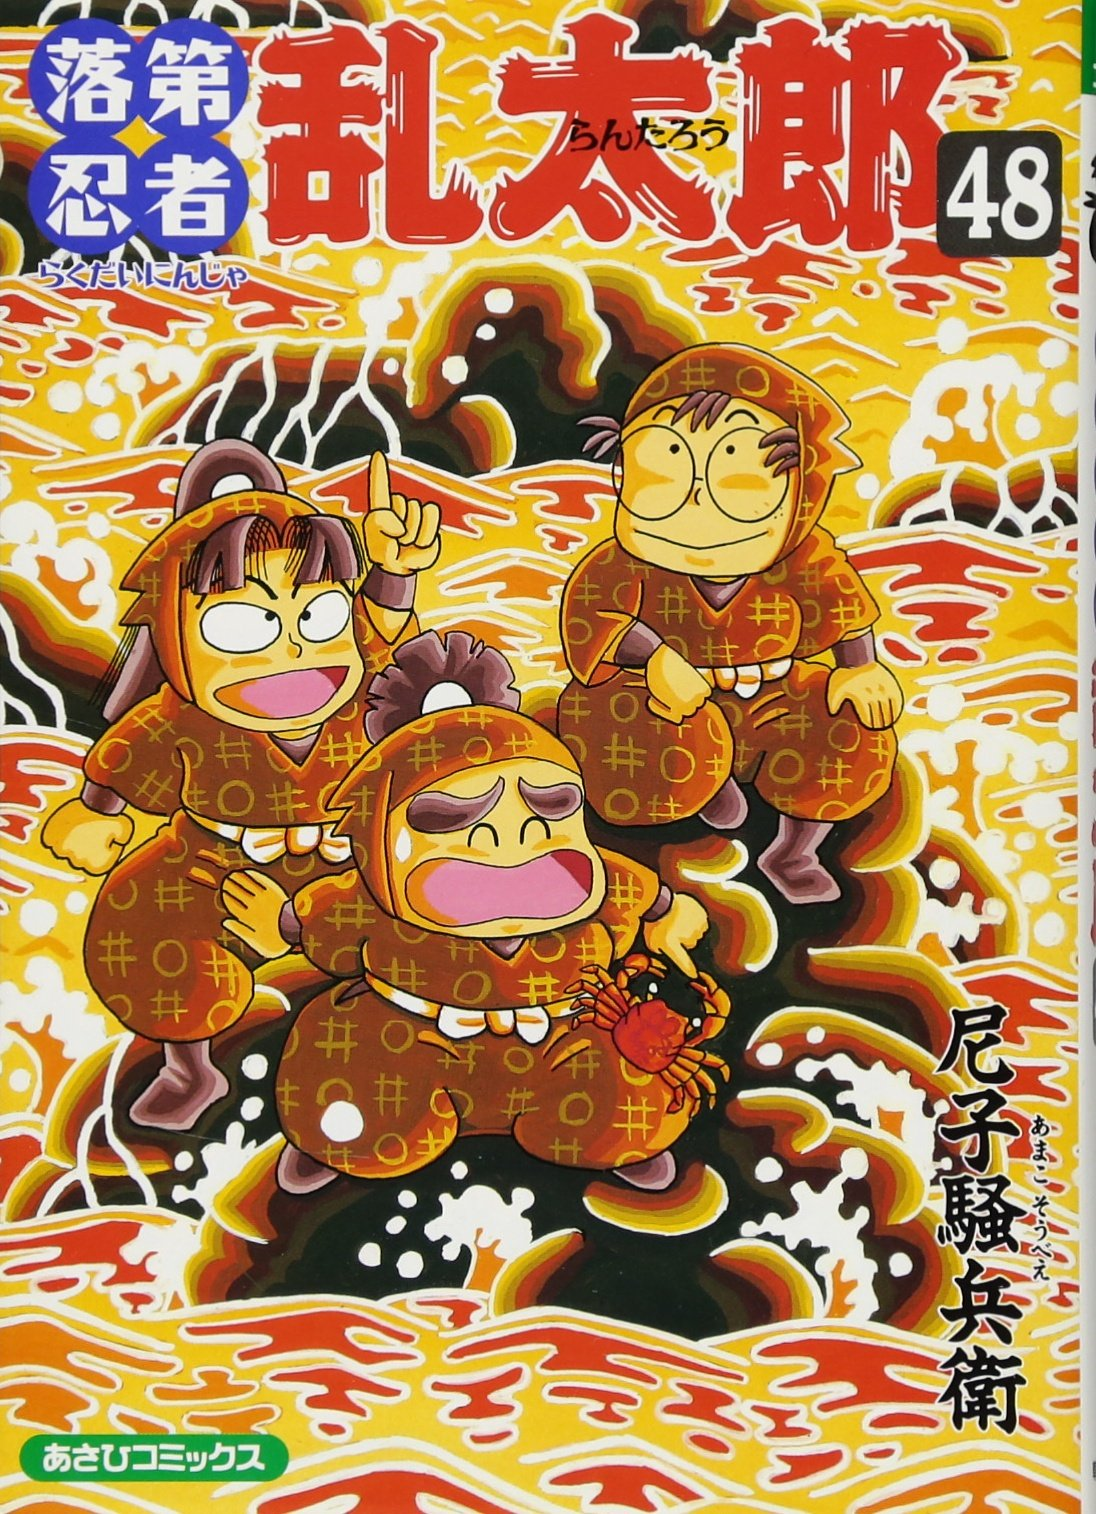 Rakudai ninja rantaro. 48.: Amazon.es: Sobee Amako: Libros